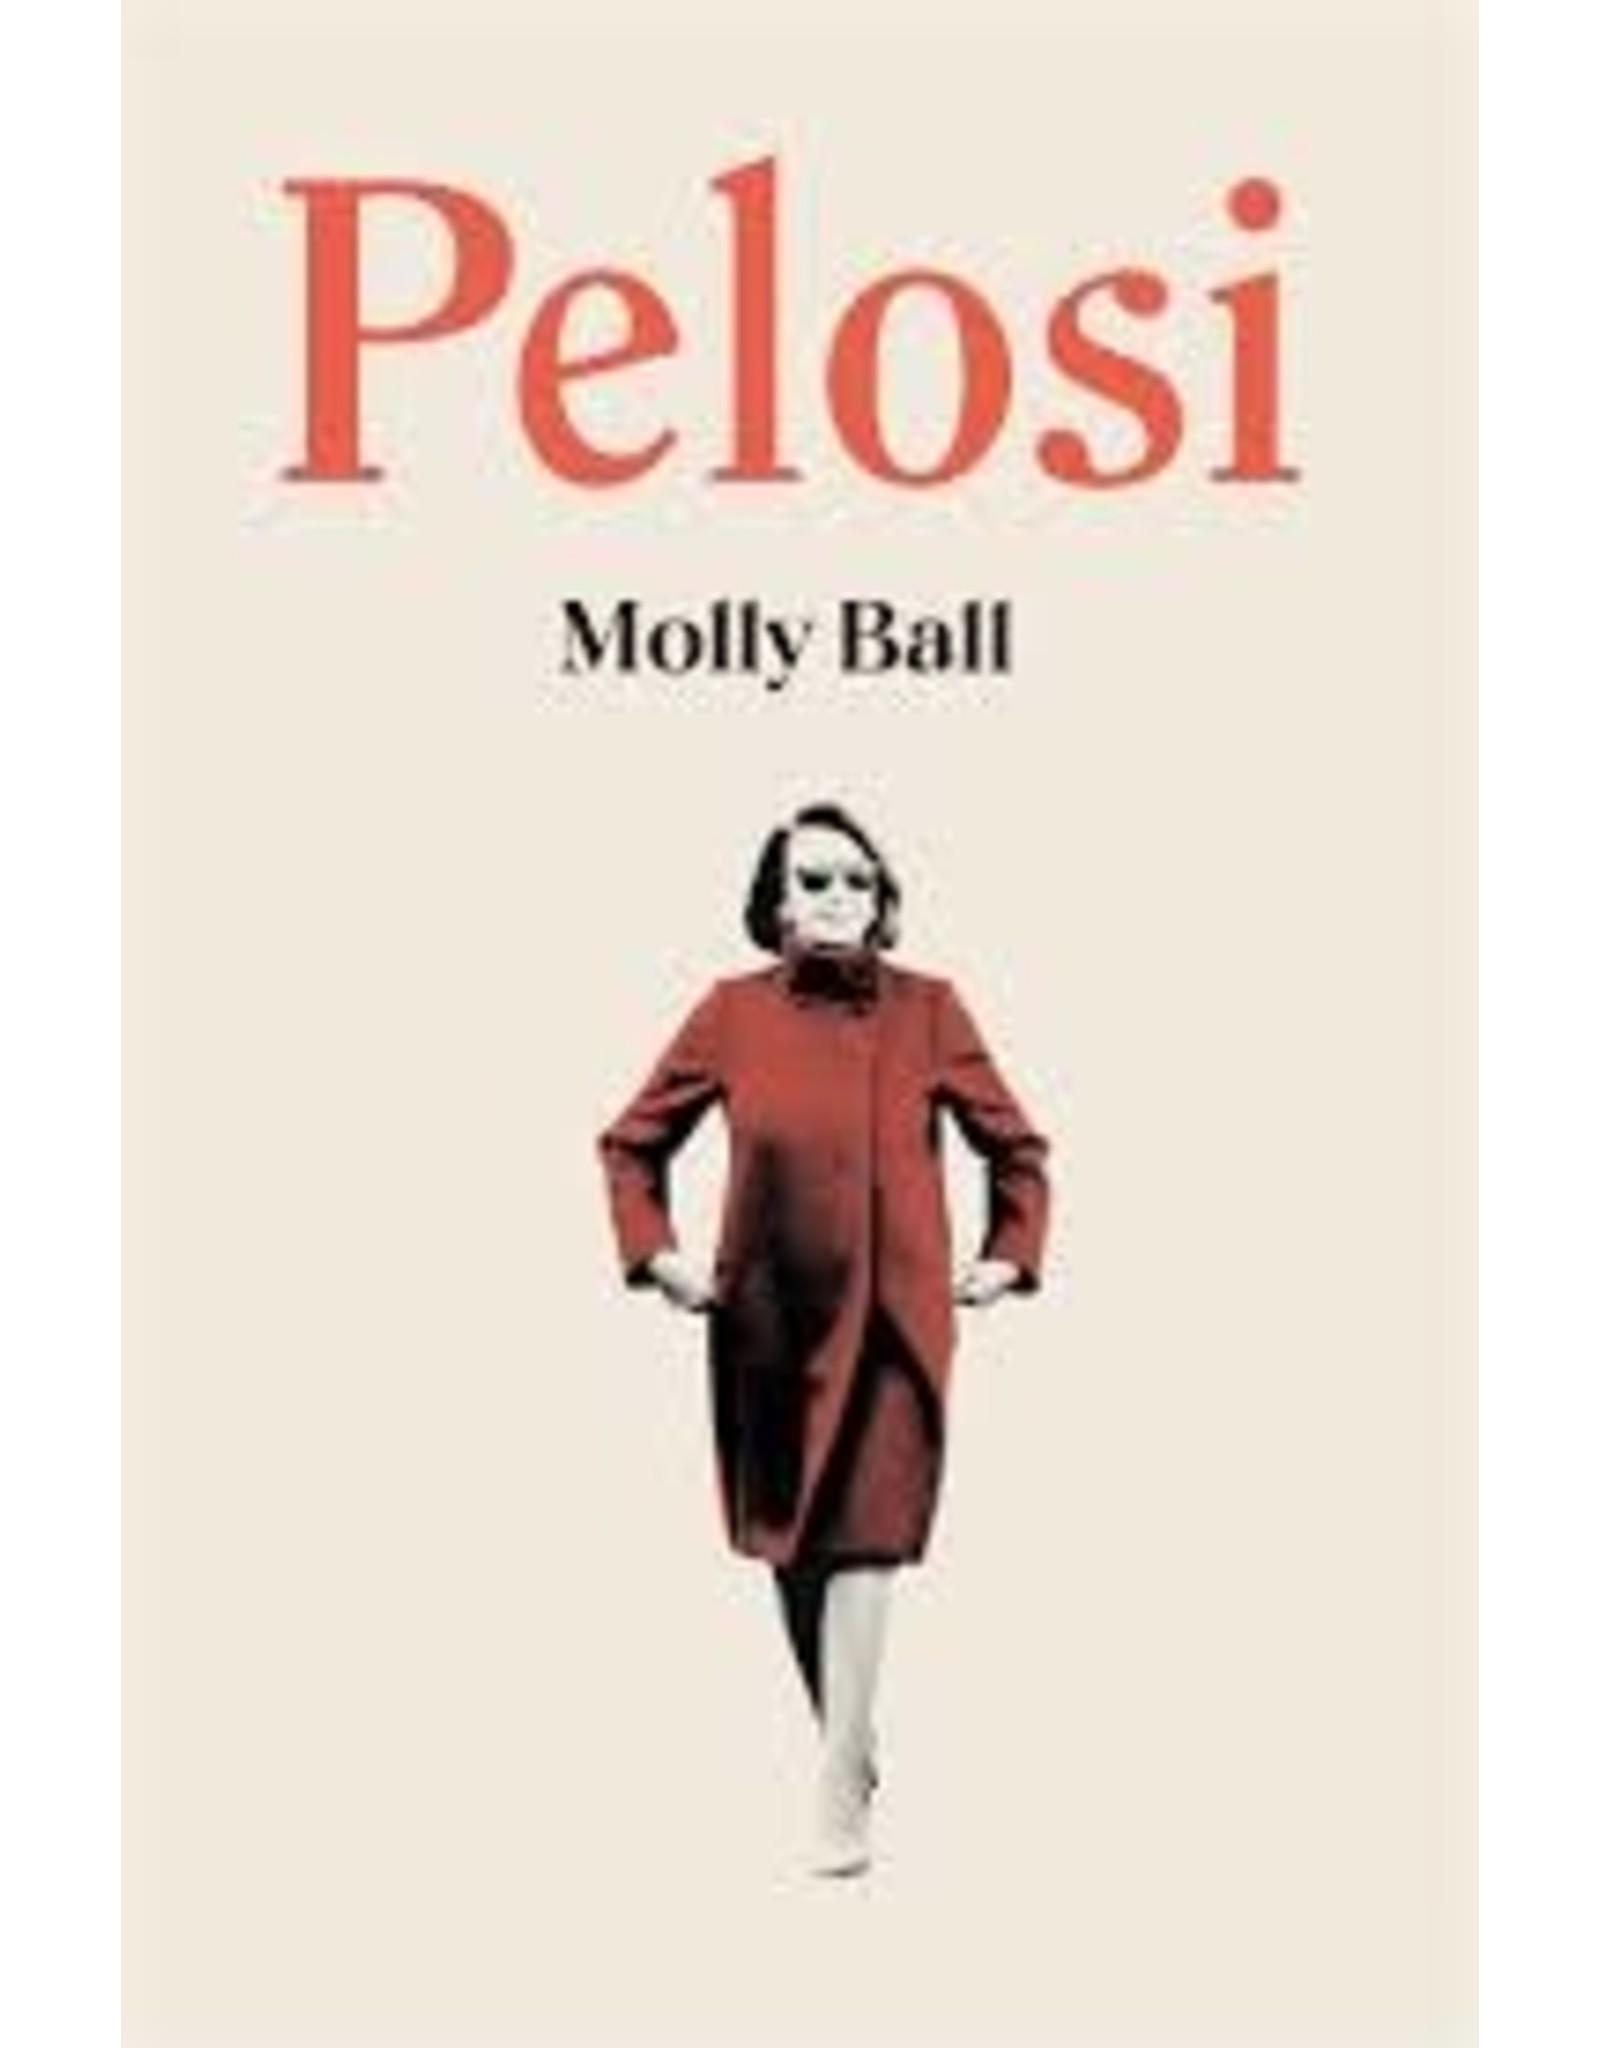 Books Pelosi by Molly Ball